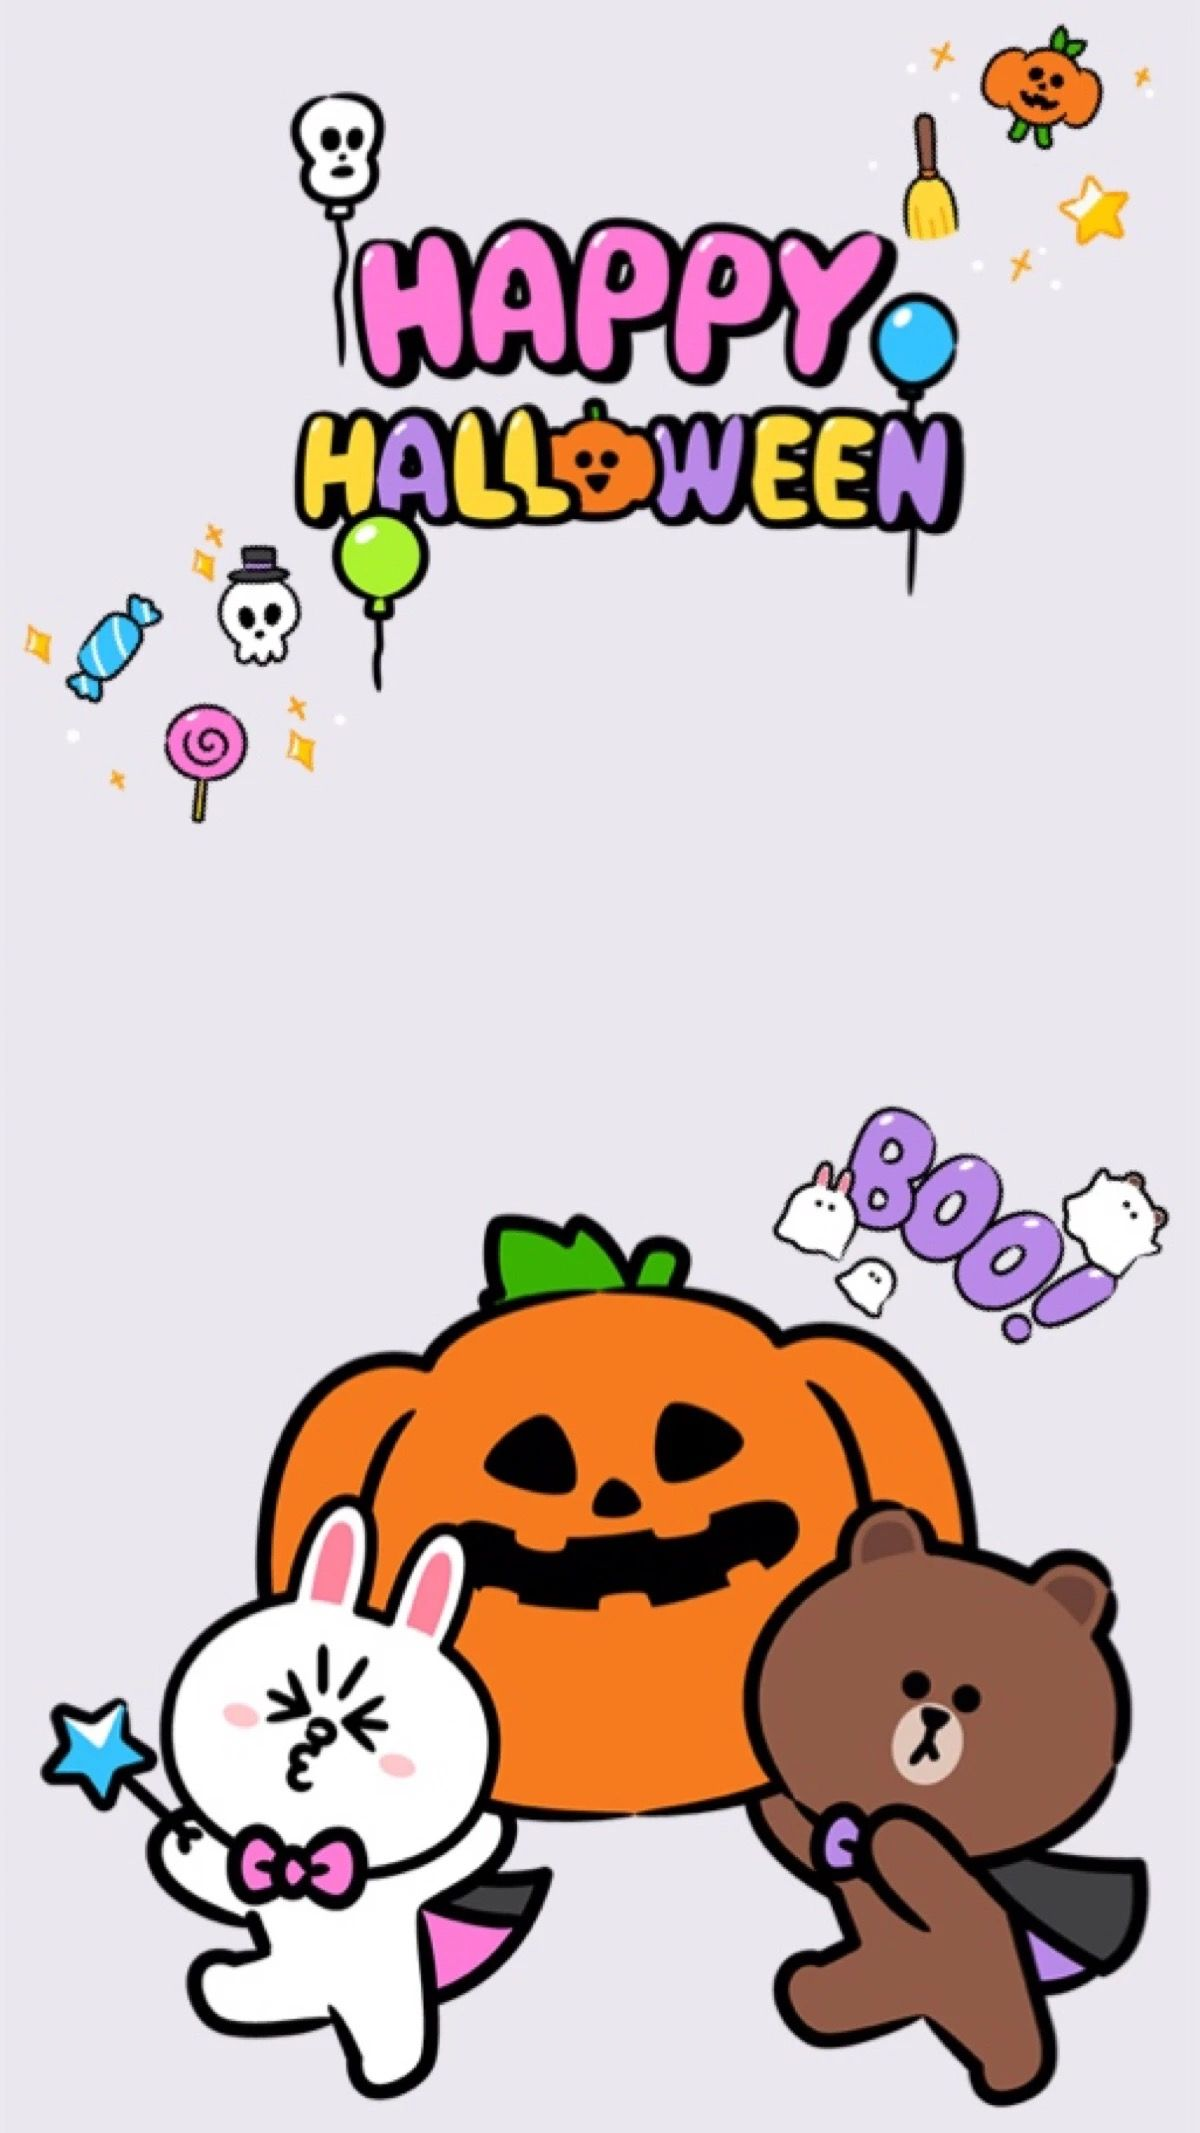 Iphone Wall Halloween Tjn Pantalla De Iphone Ilustraciones